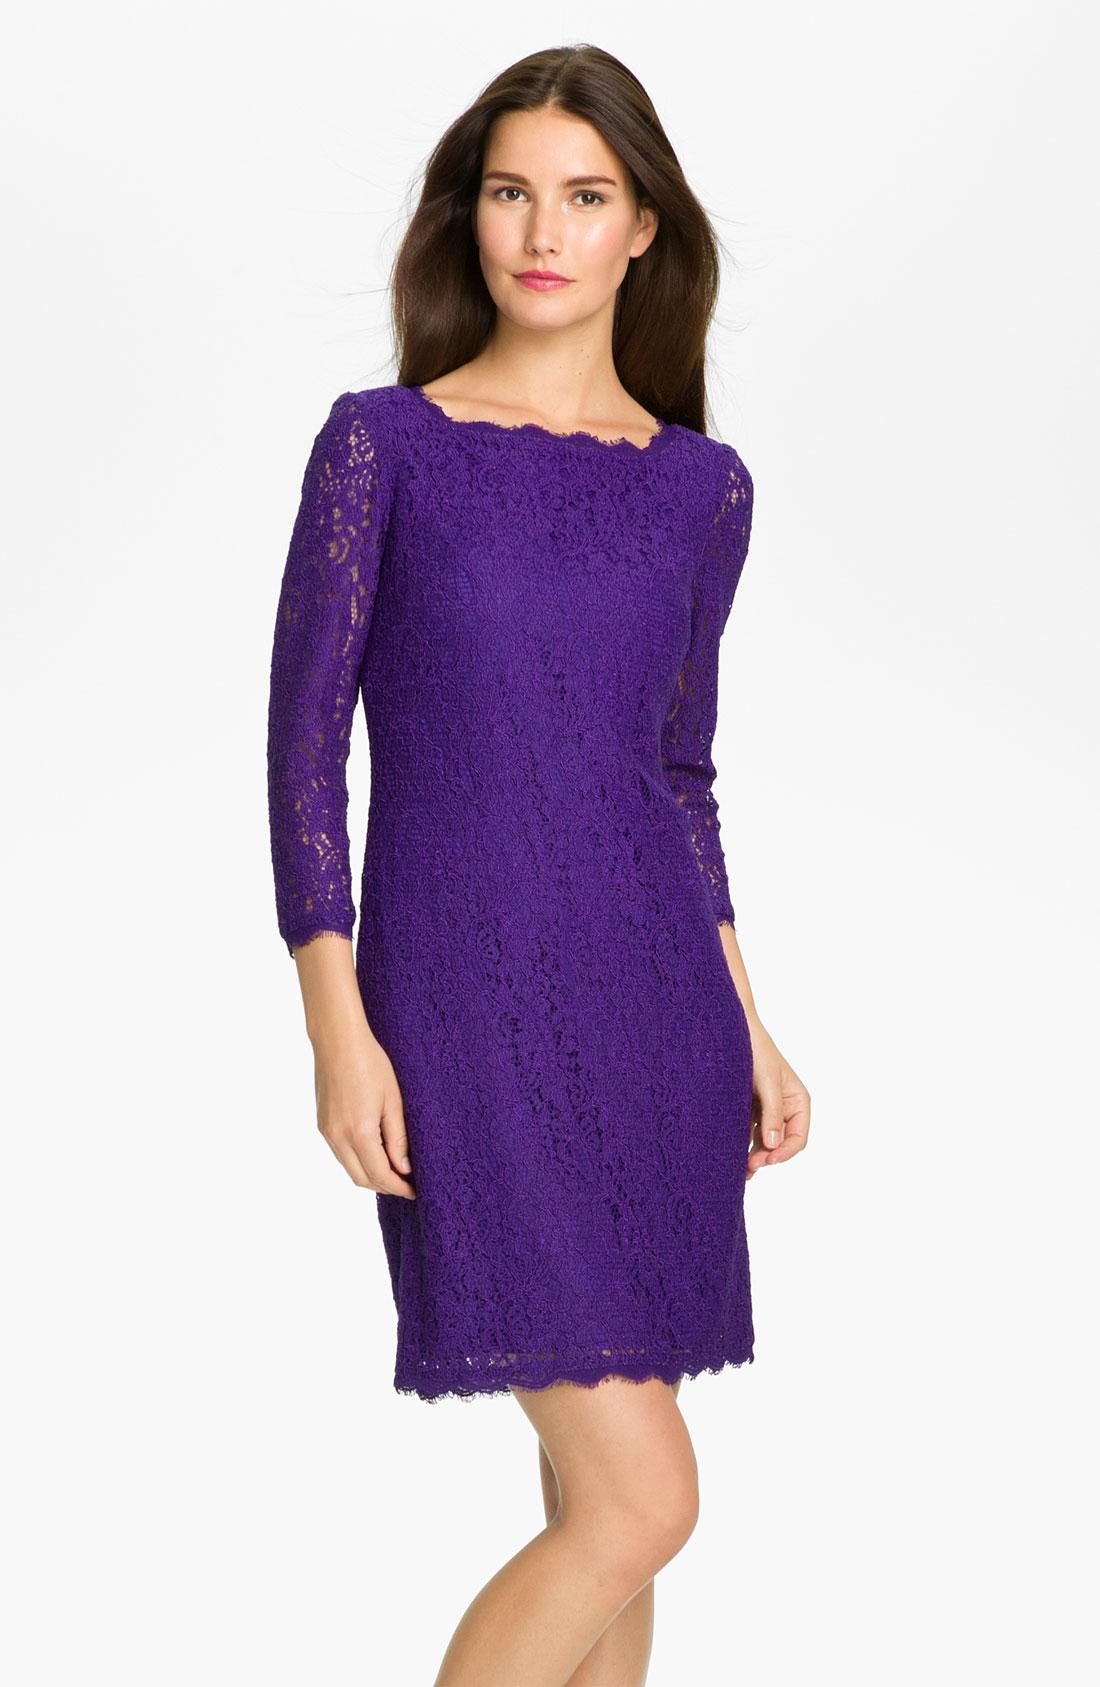 ... Dress See Sheath Dresses See Lace Dresses See Adrianna Papell Sheath